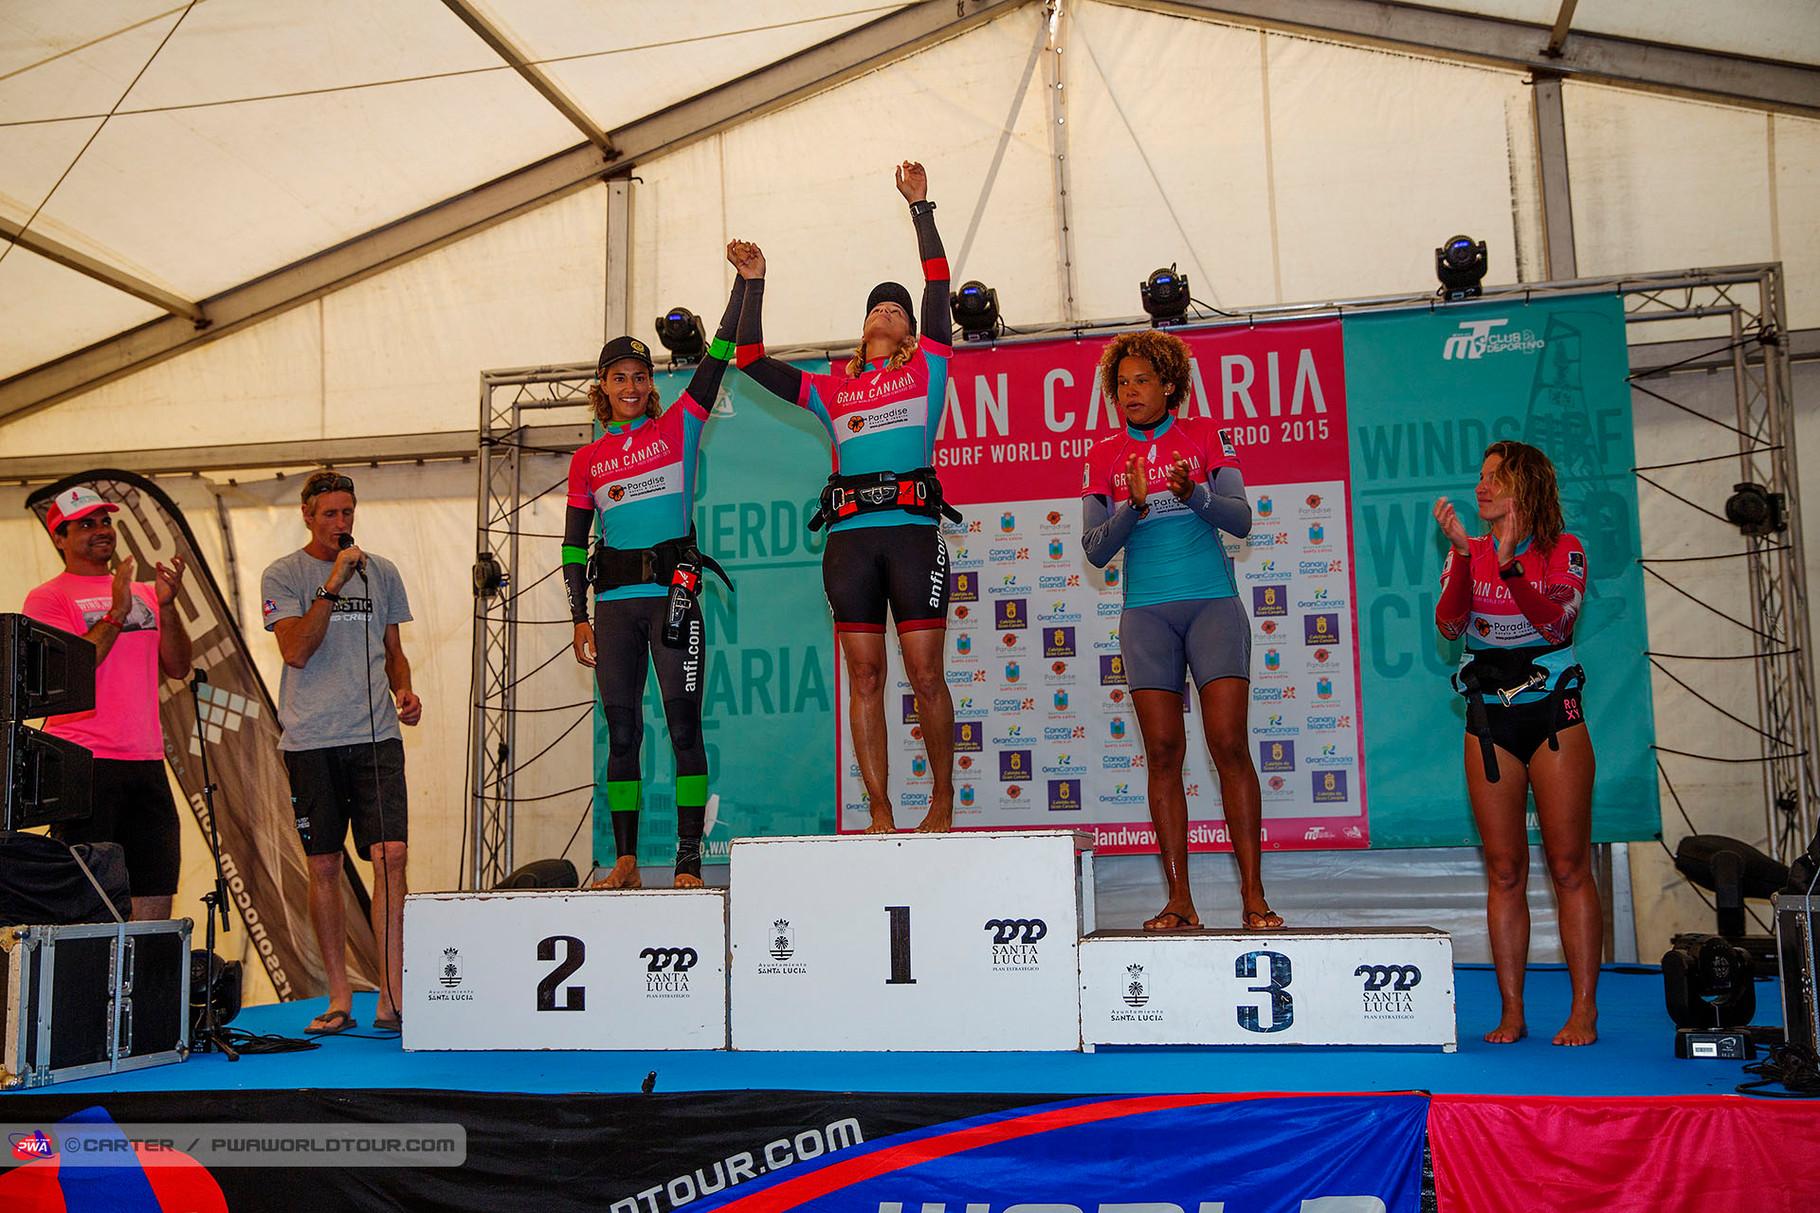 Winner Girls Single: 1. Daida Moreno, 2. Iballa Moreno, 3. Offringa, 4. Beenen